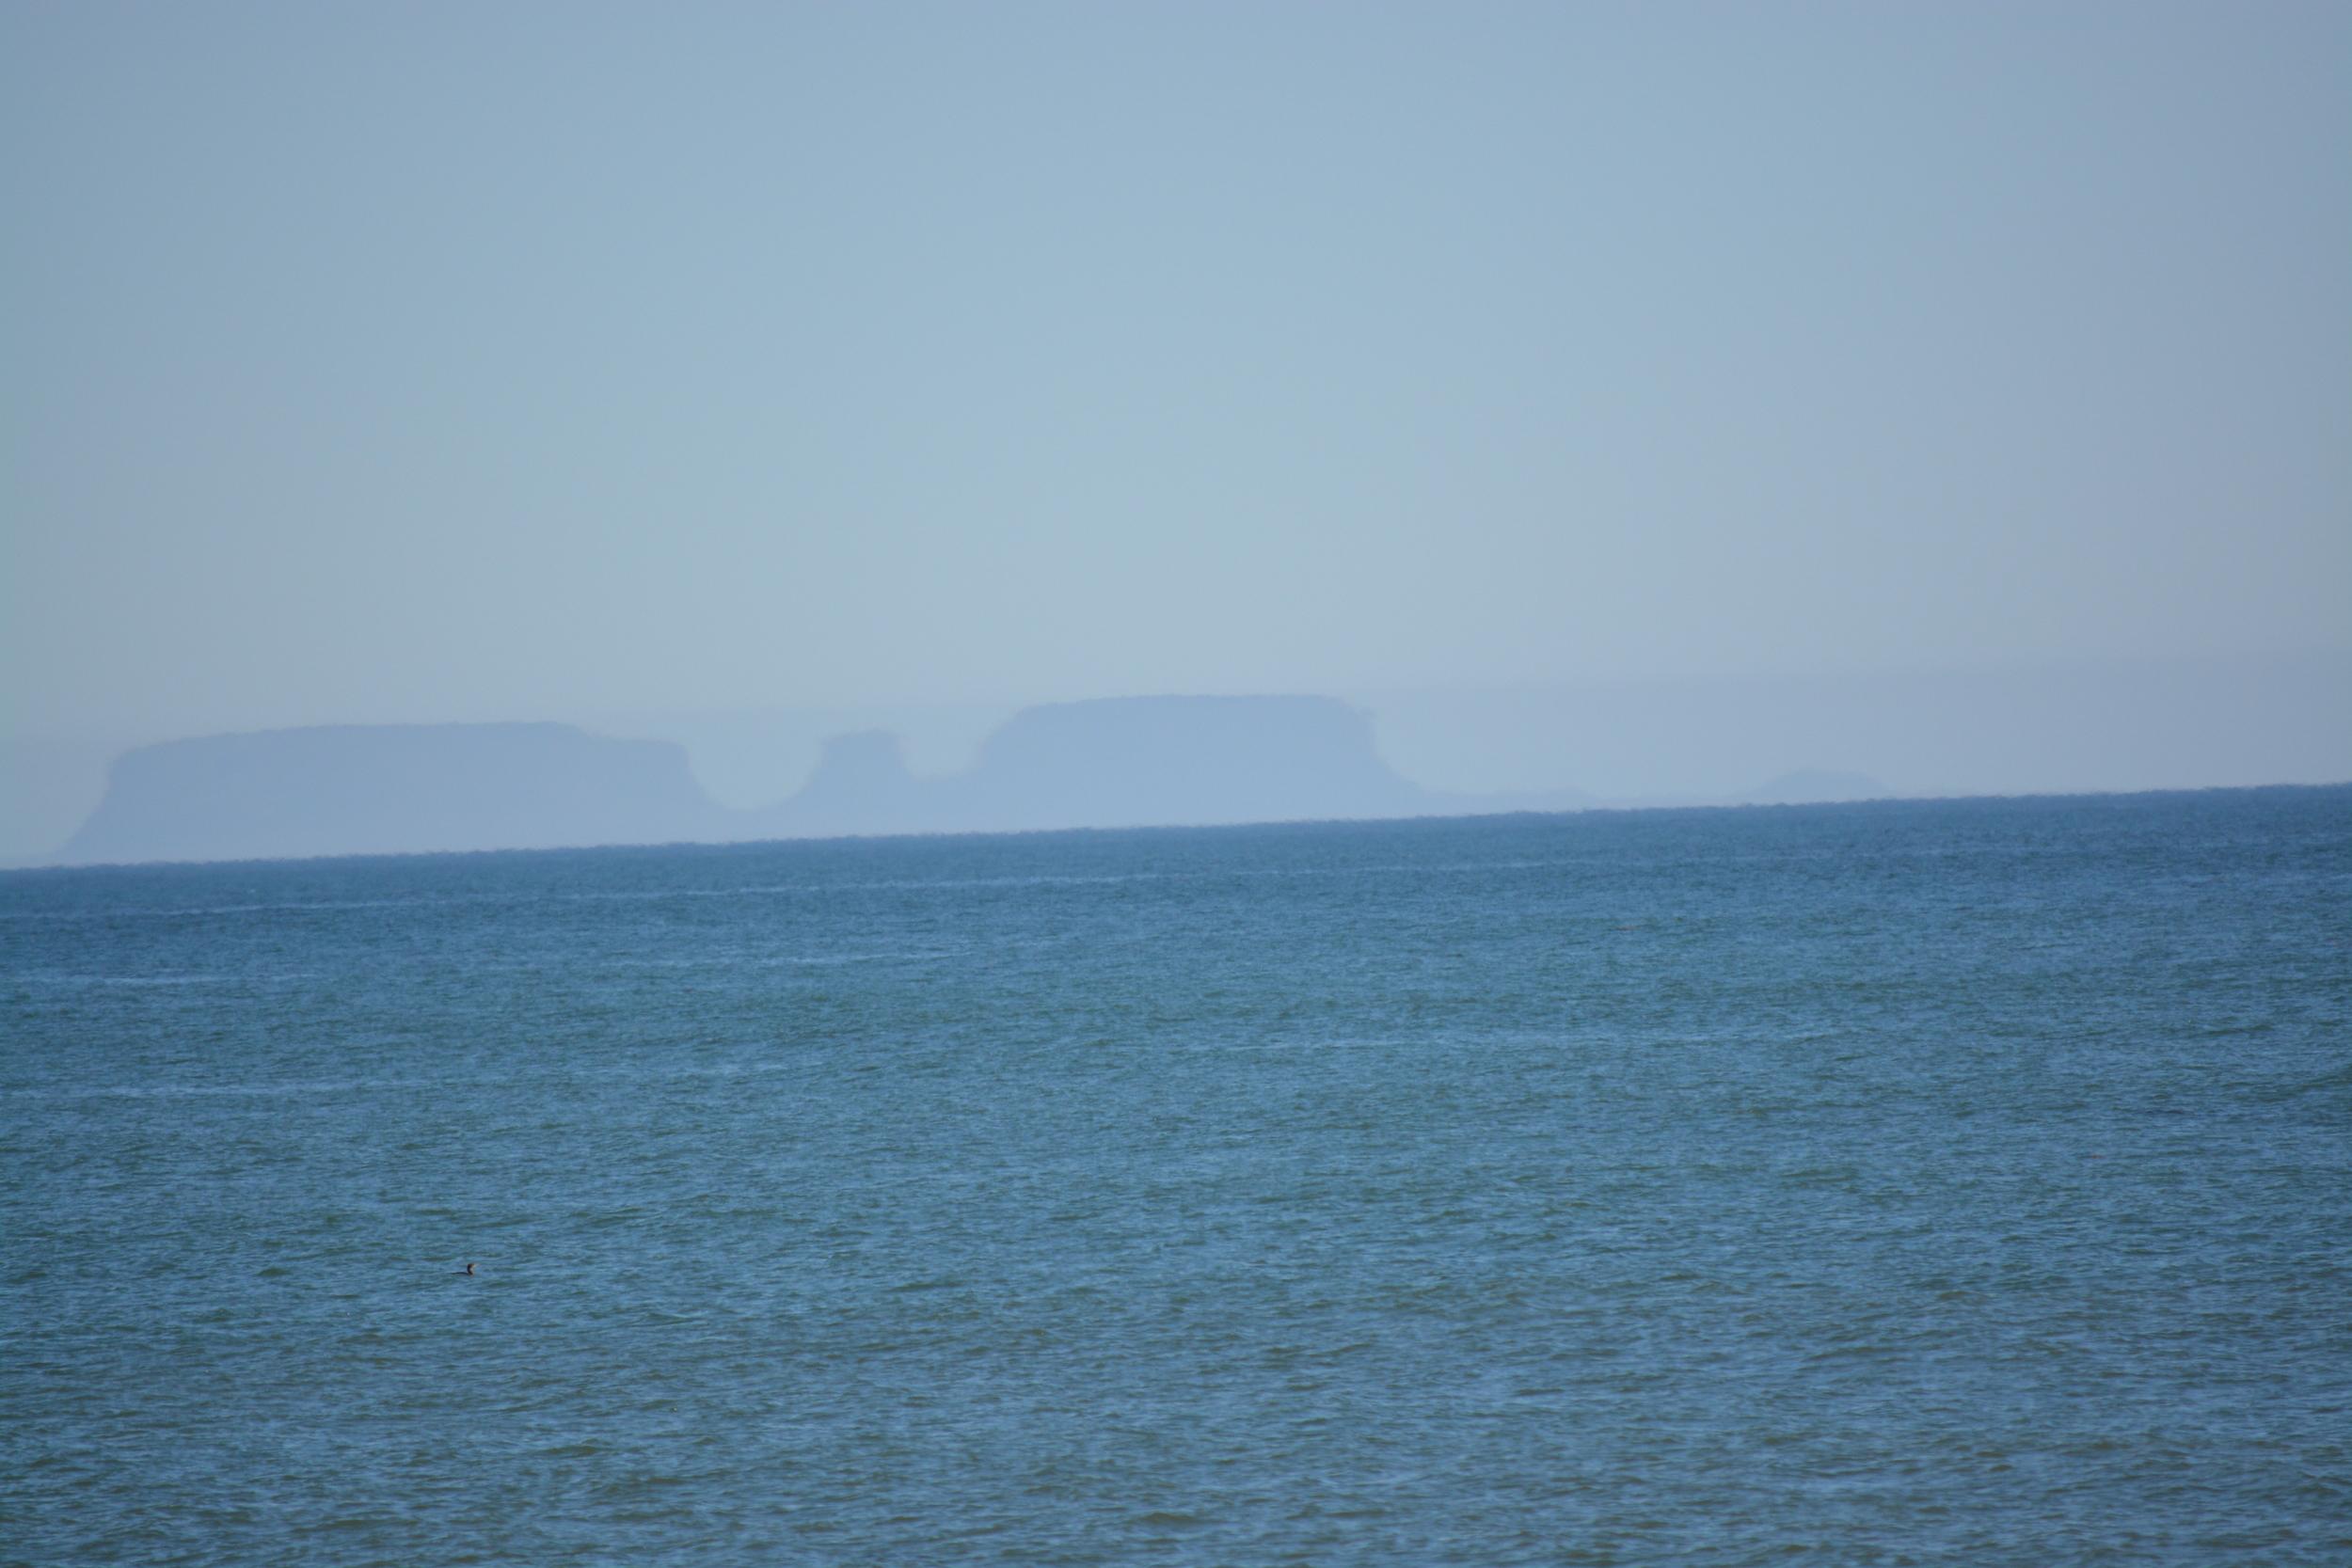 Baja California 10-5-13 Shipwrecks Surfing Adventure Ocean Experience Surf School San Diego (84).JPG